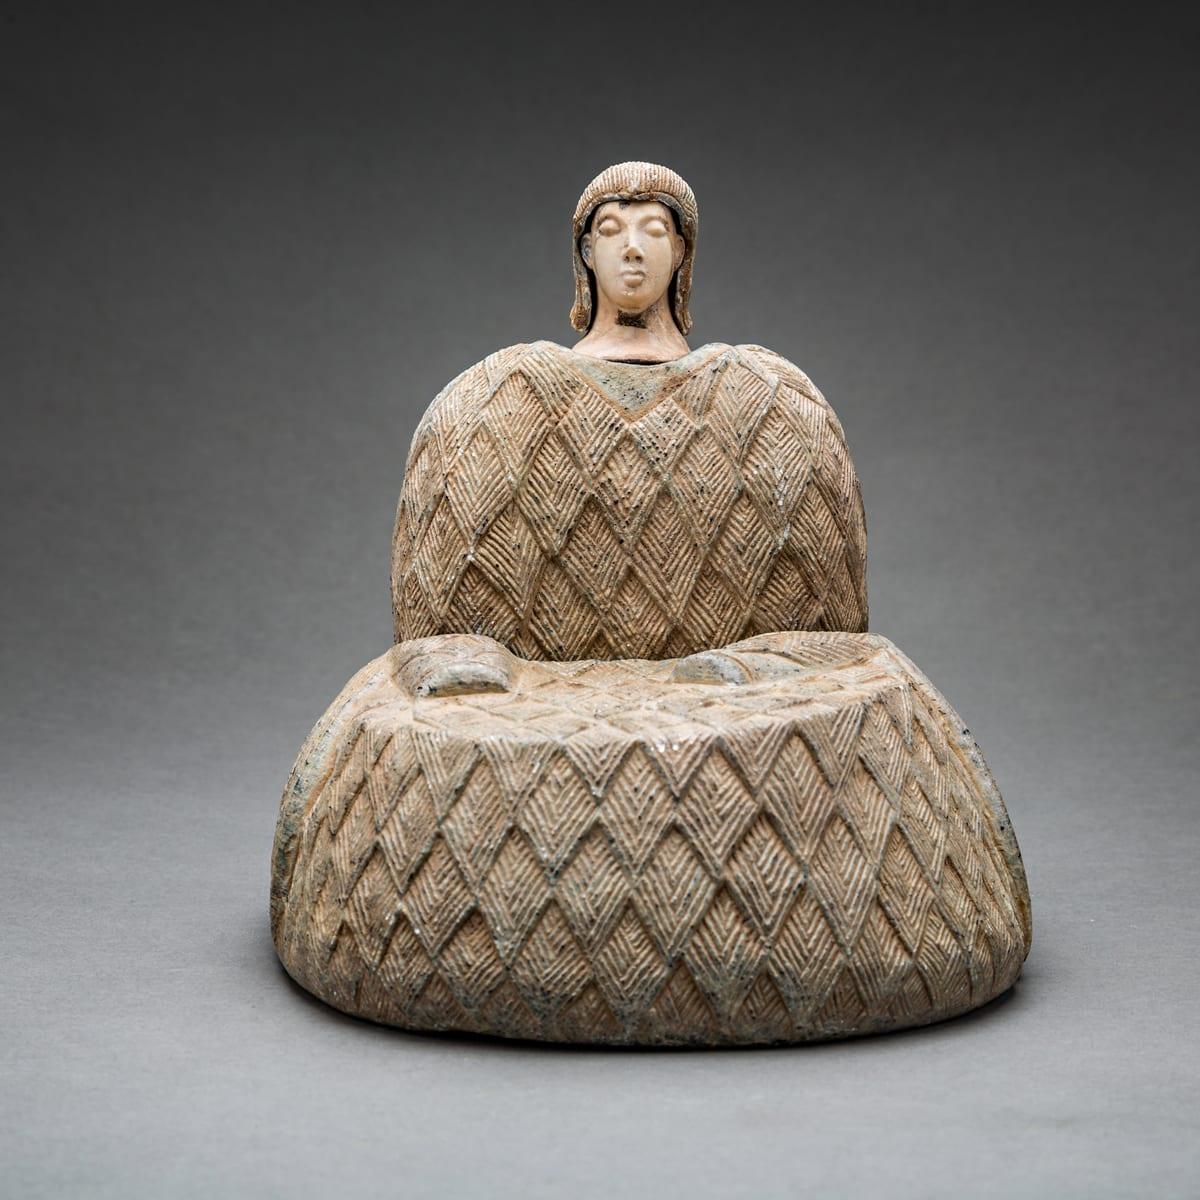 Bactrian Idol, 2800 BCE - 2300 BCE